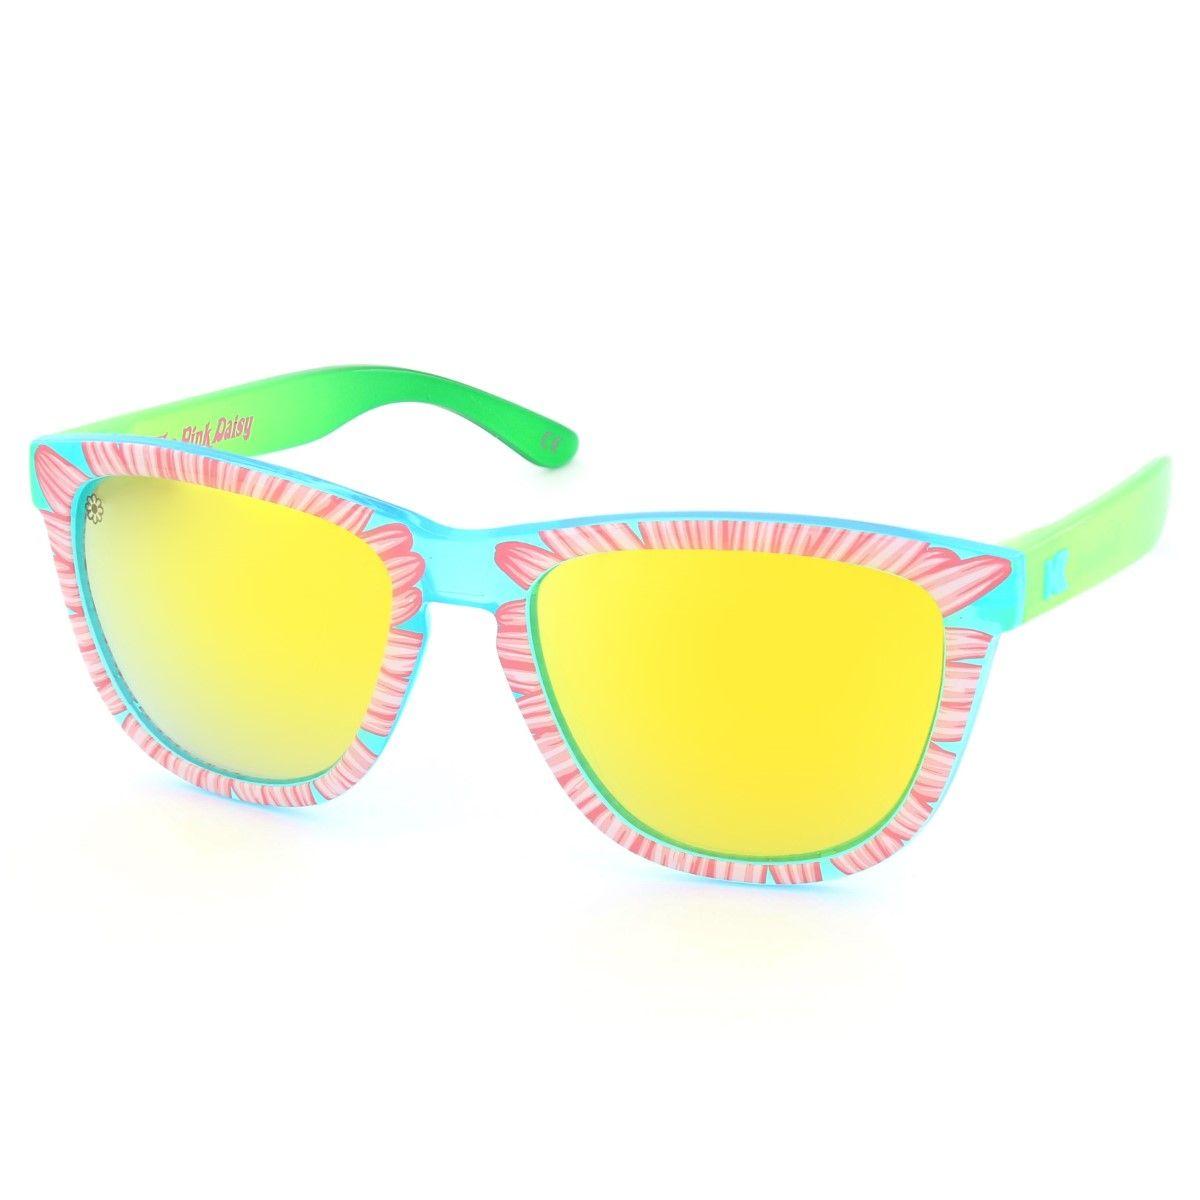 Knockaround Pink Daisy Premium Unisex Sunglasses